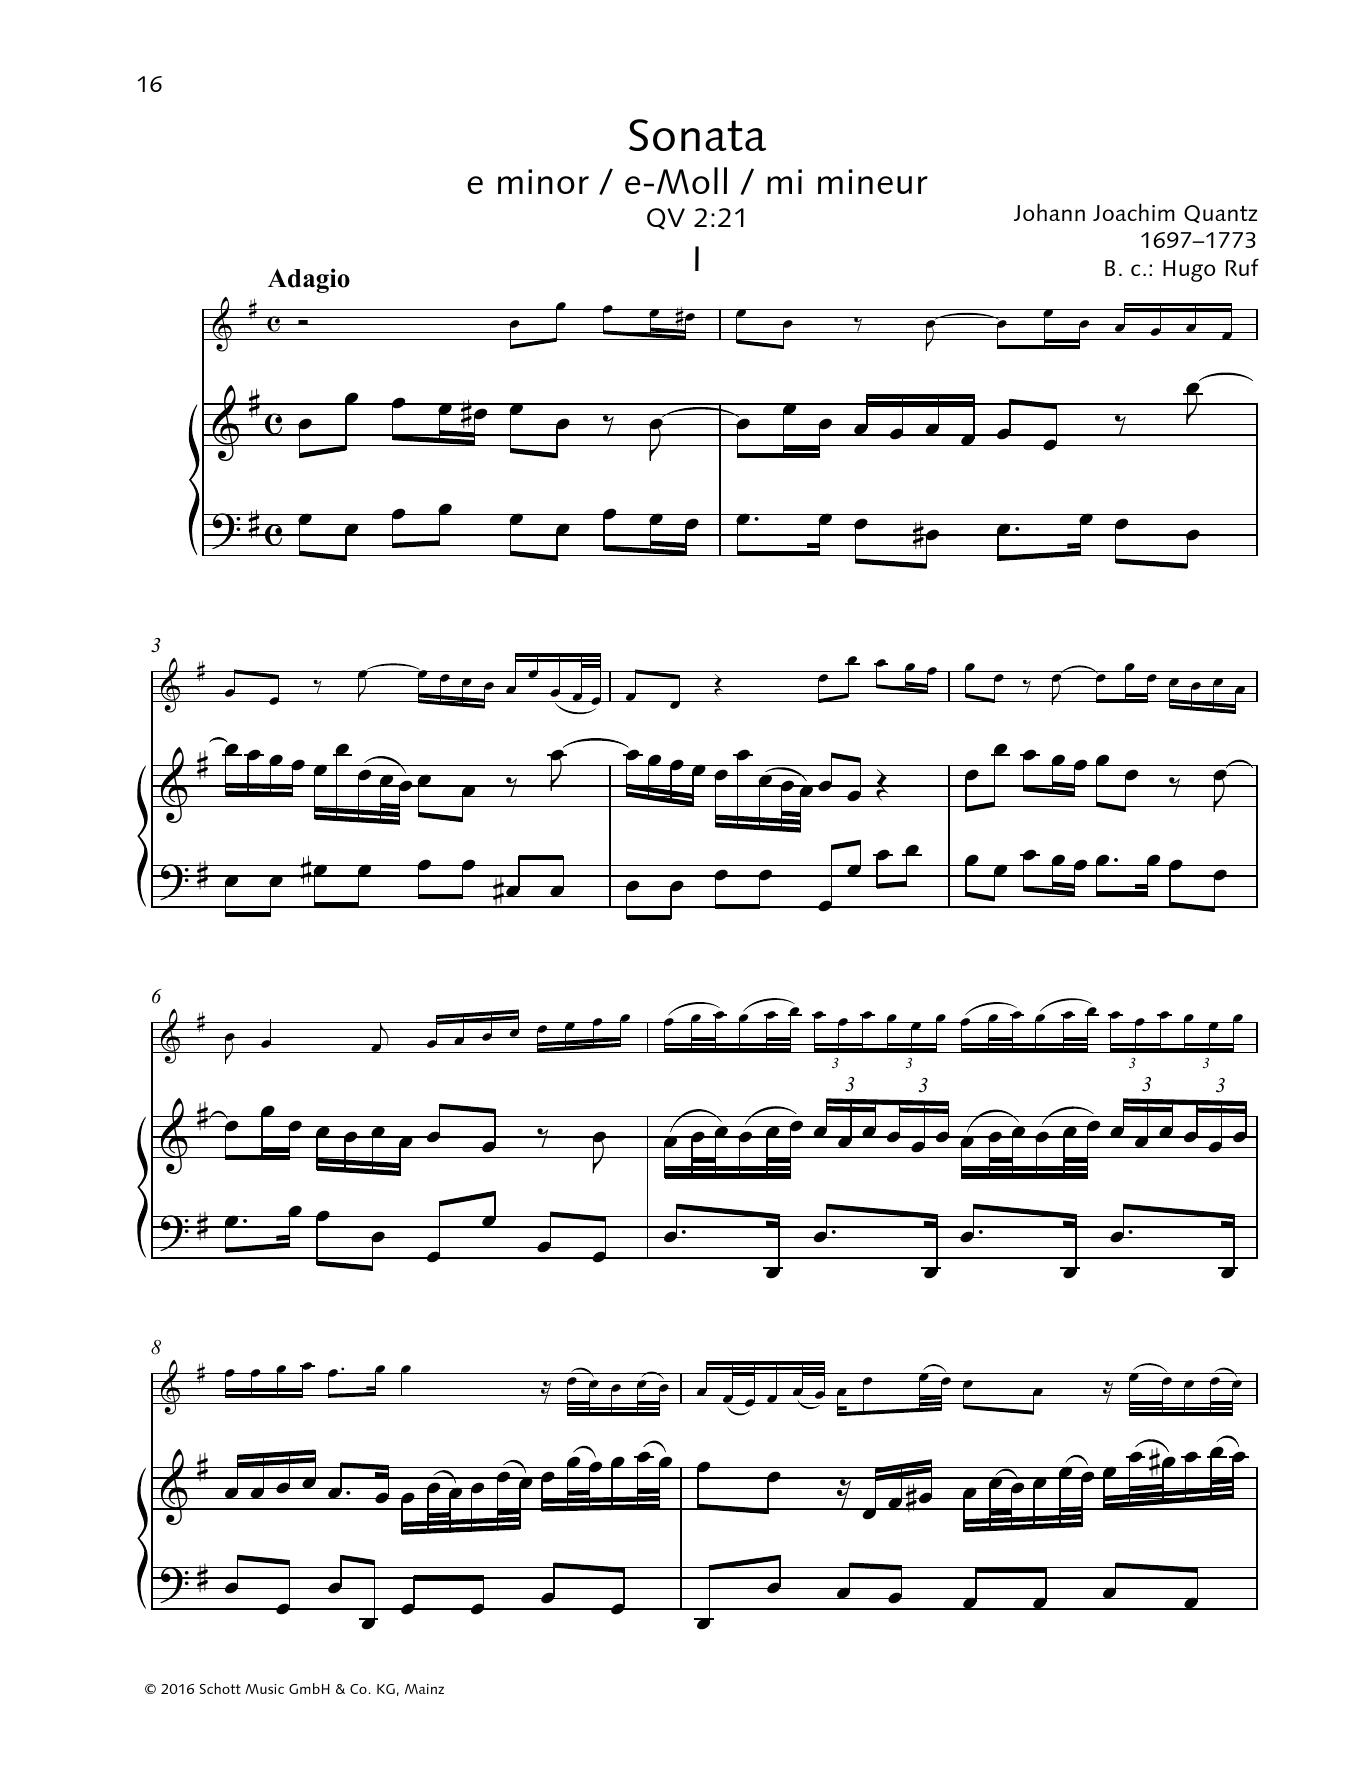 Sonata E minor Sheet Music